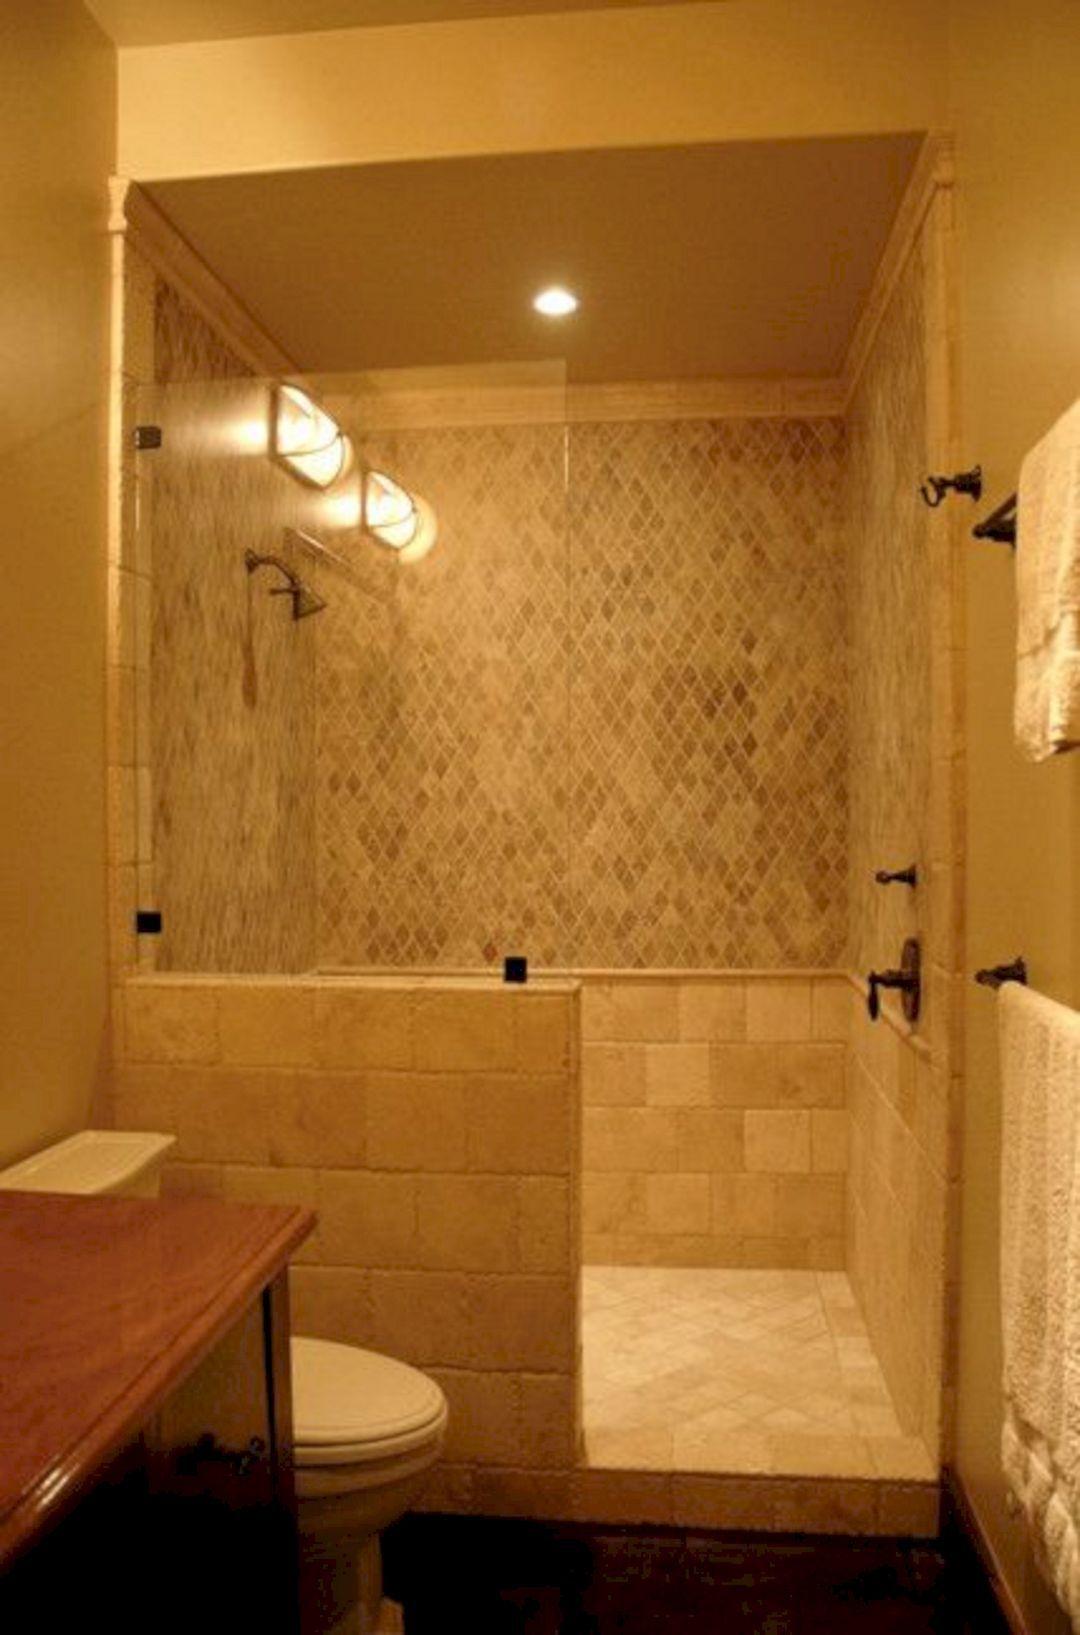 Adorable 25 Small Bathroom Shower Doorless Design Ideas Freshouz Com With Mediterranean Remodel Master